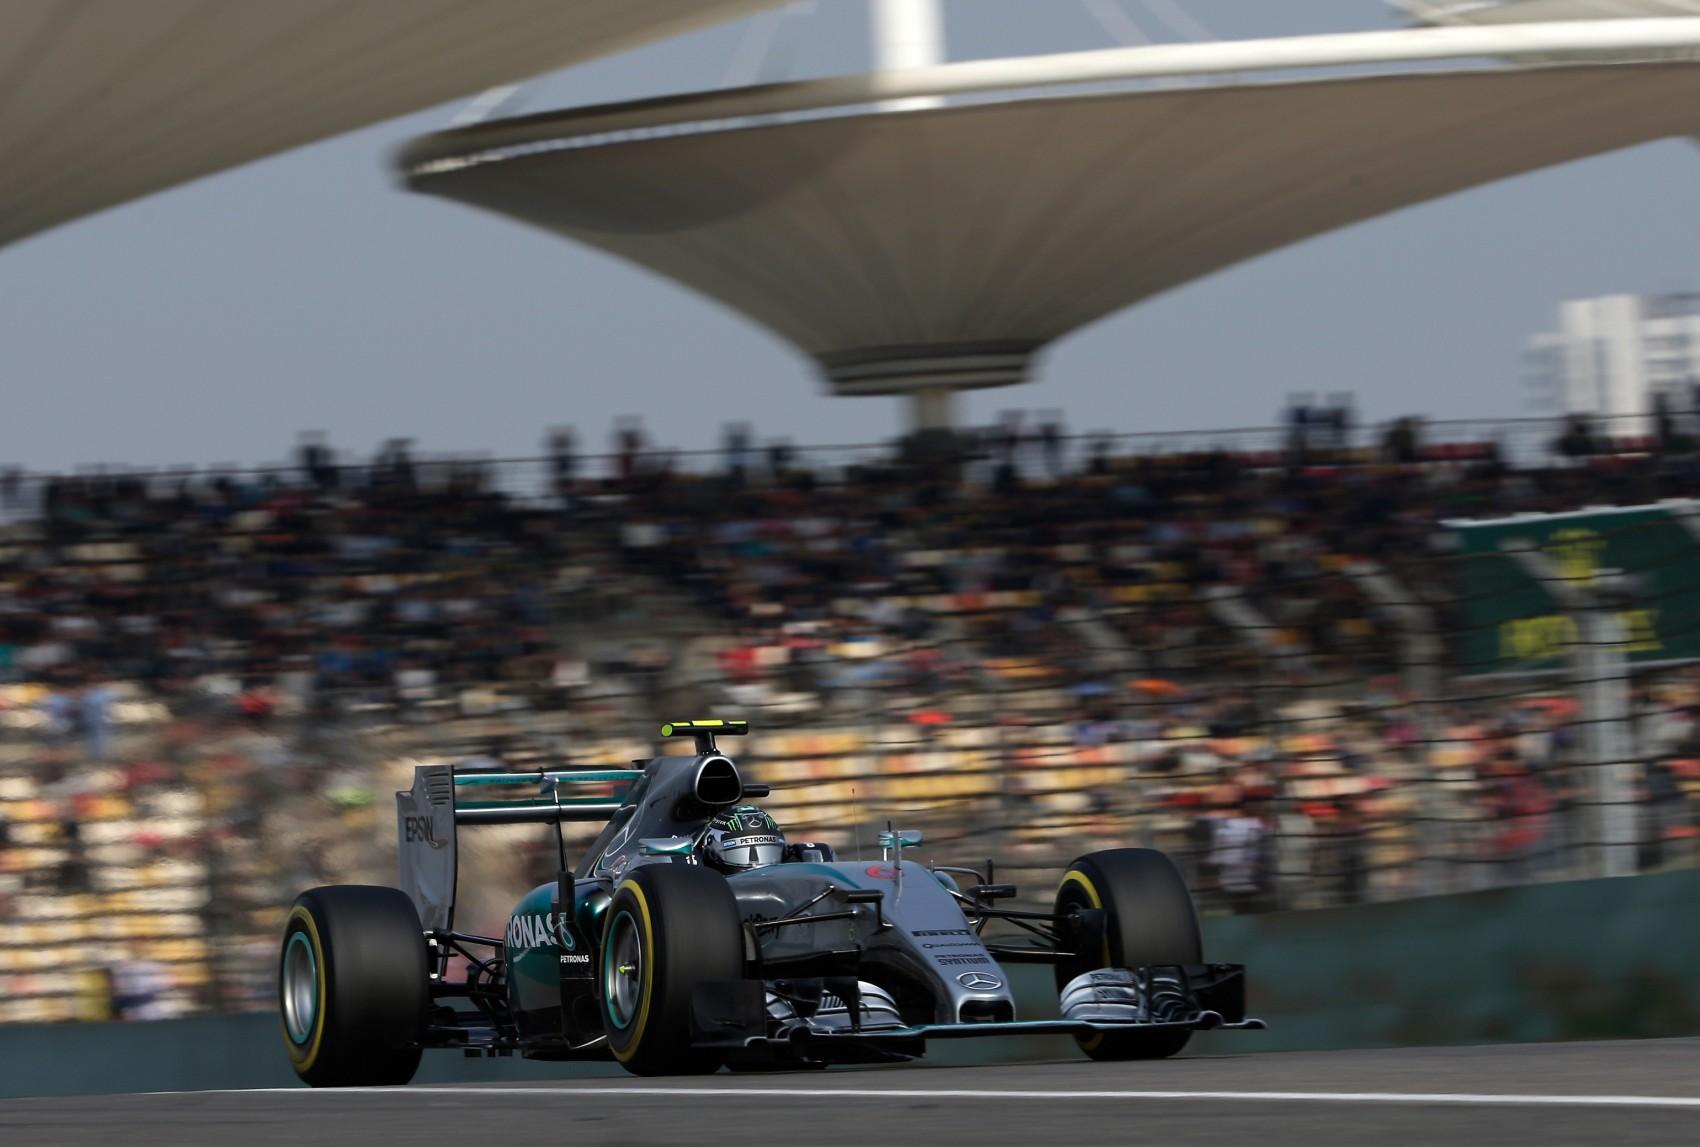 Má Rosberg na titul?